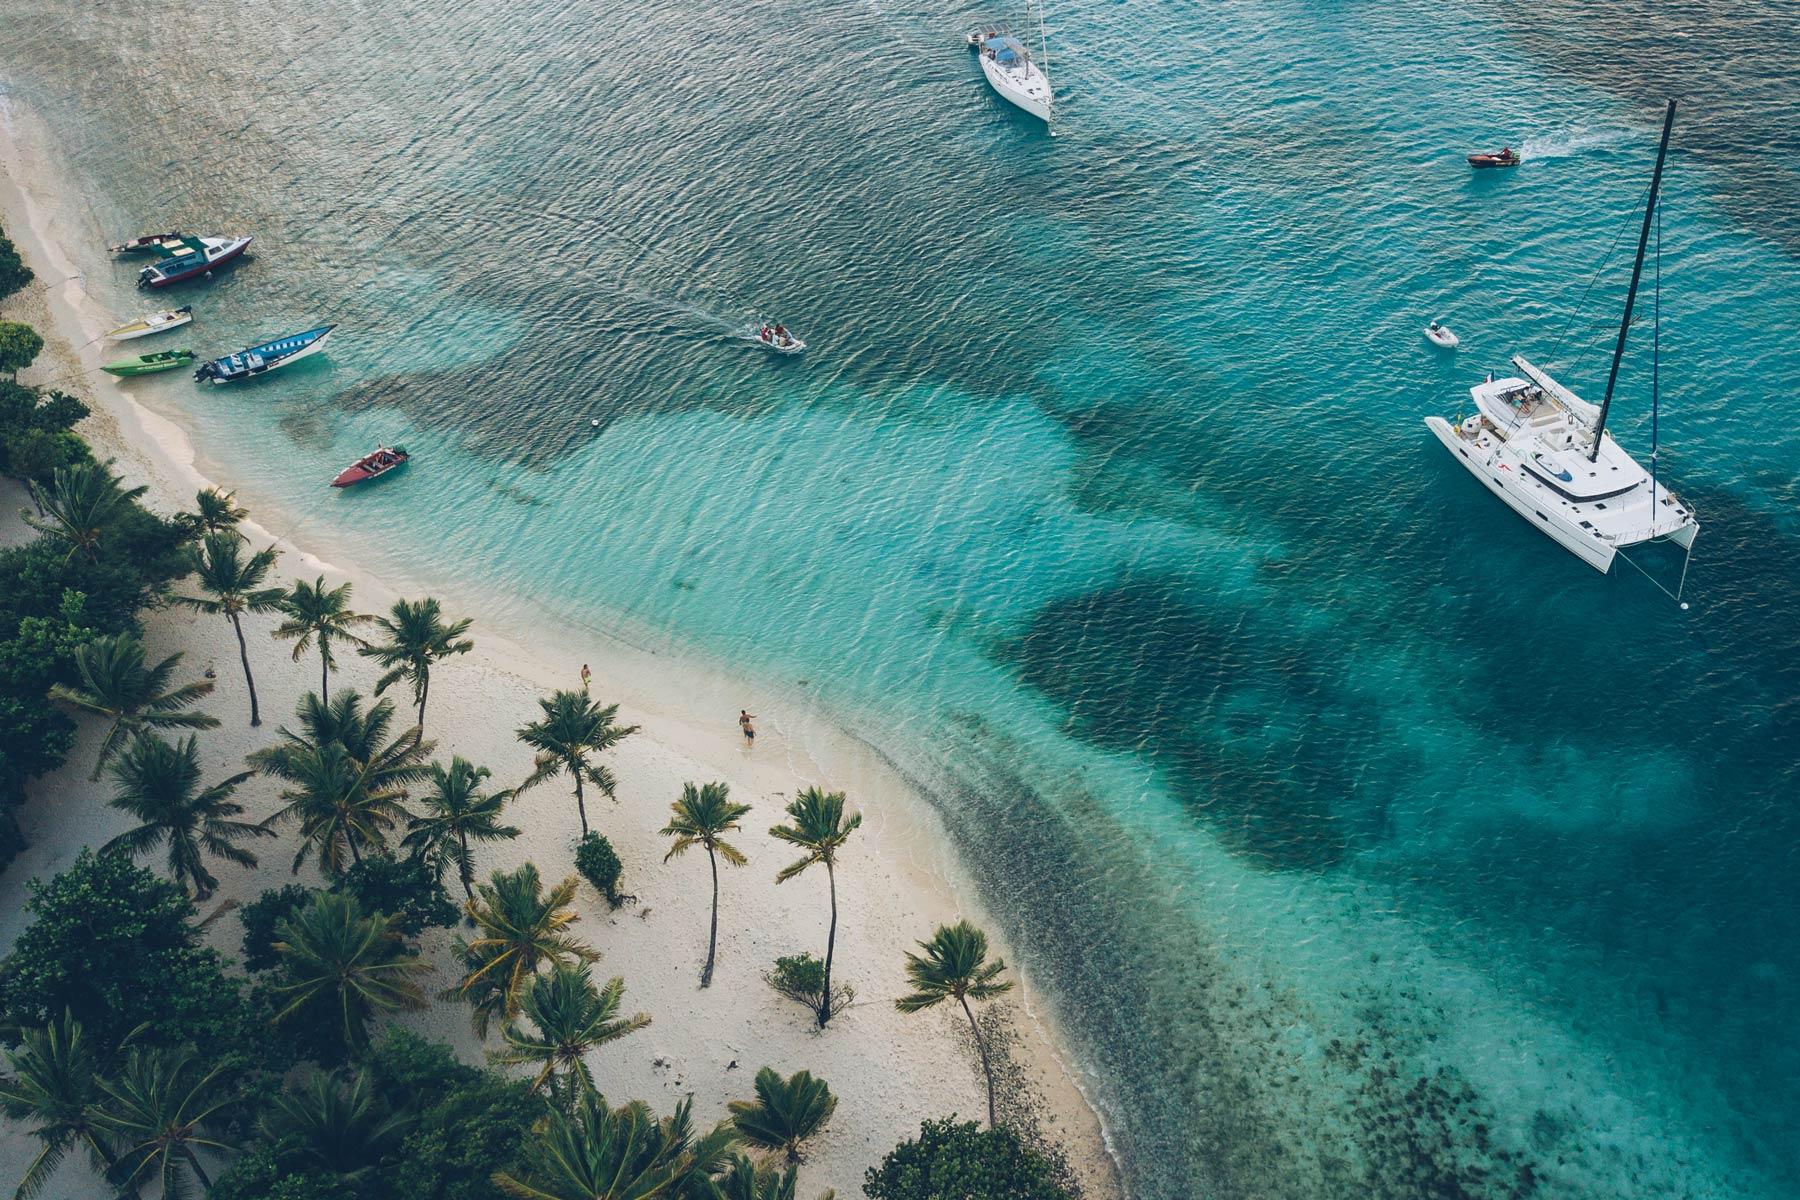 Croisiere en Catamaran dans les Grenadines